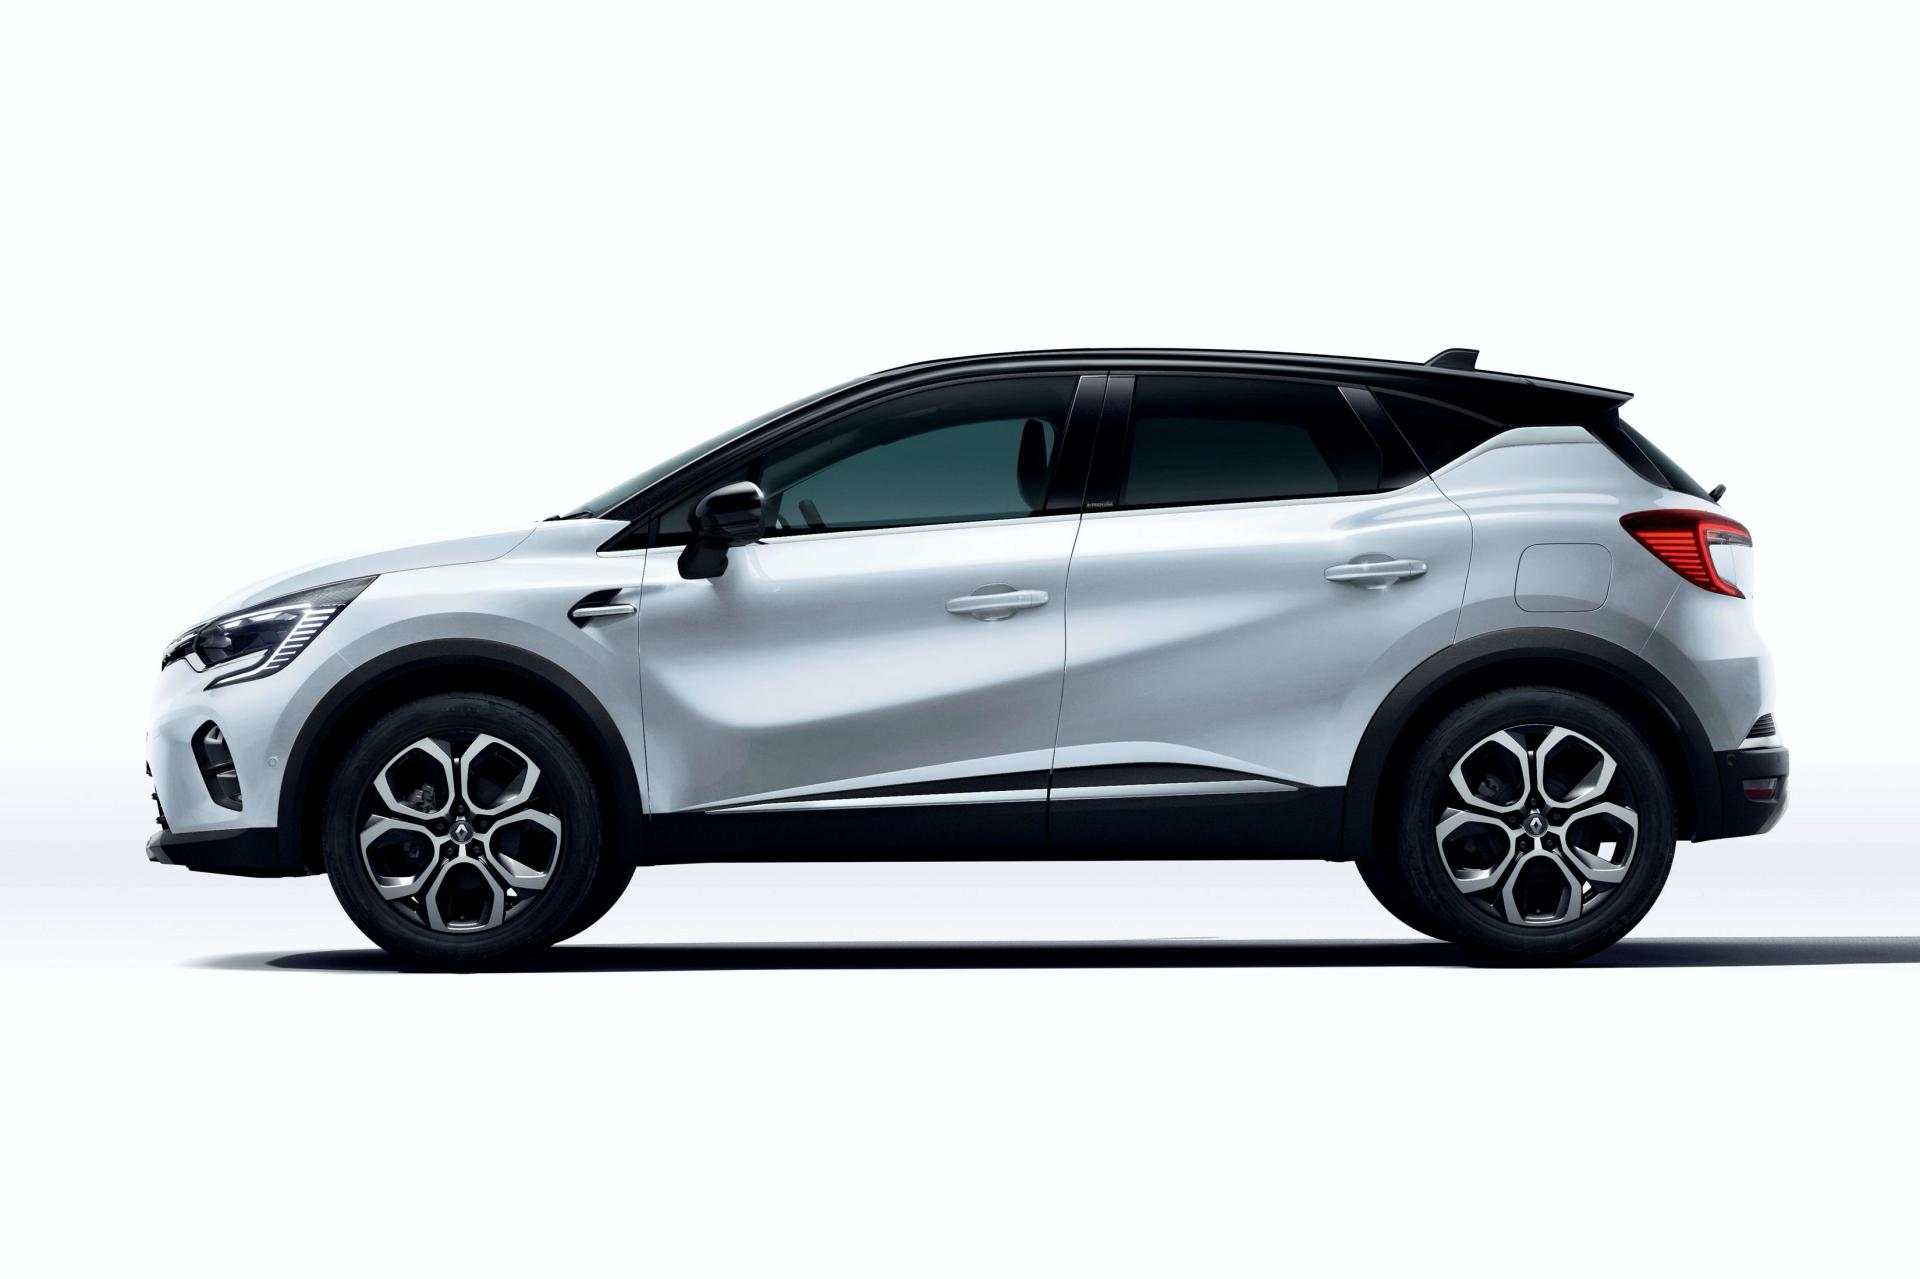 2020-Renault-Captur-E-Tech-plug-in-hybrid-11